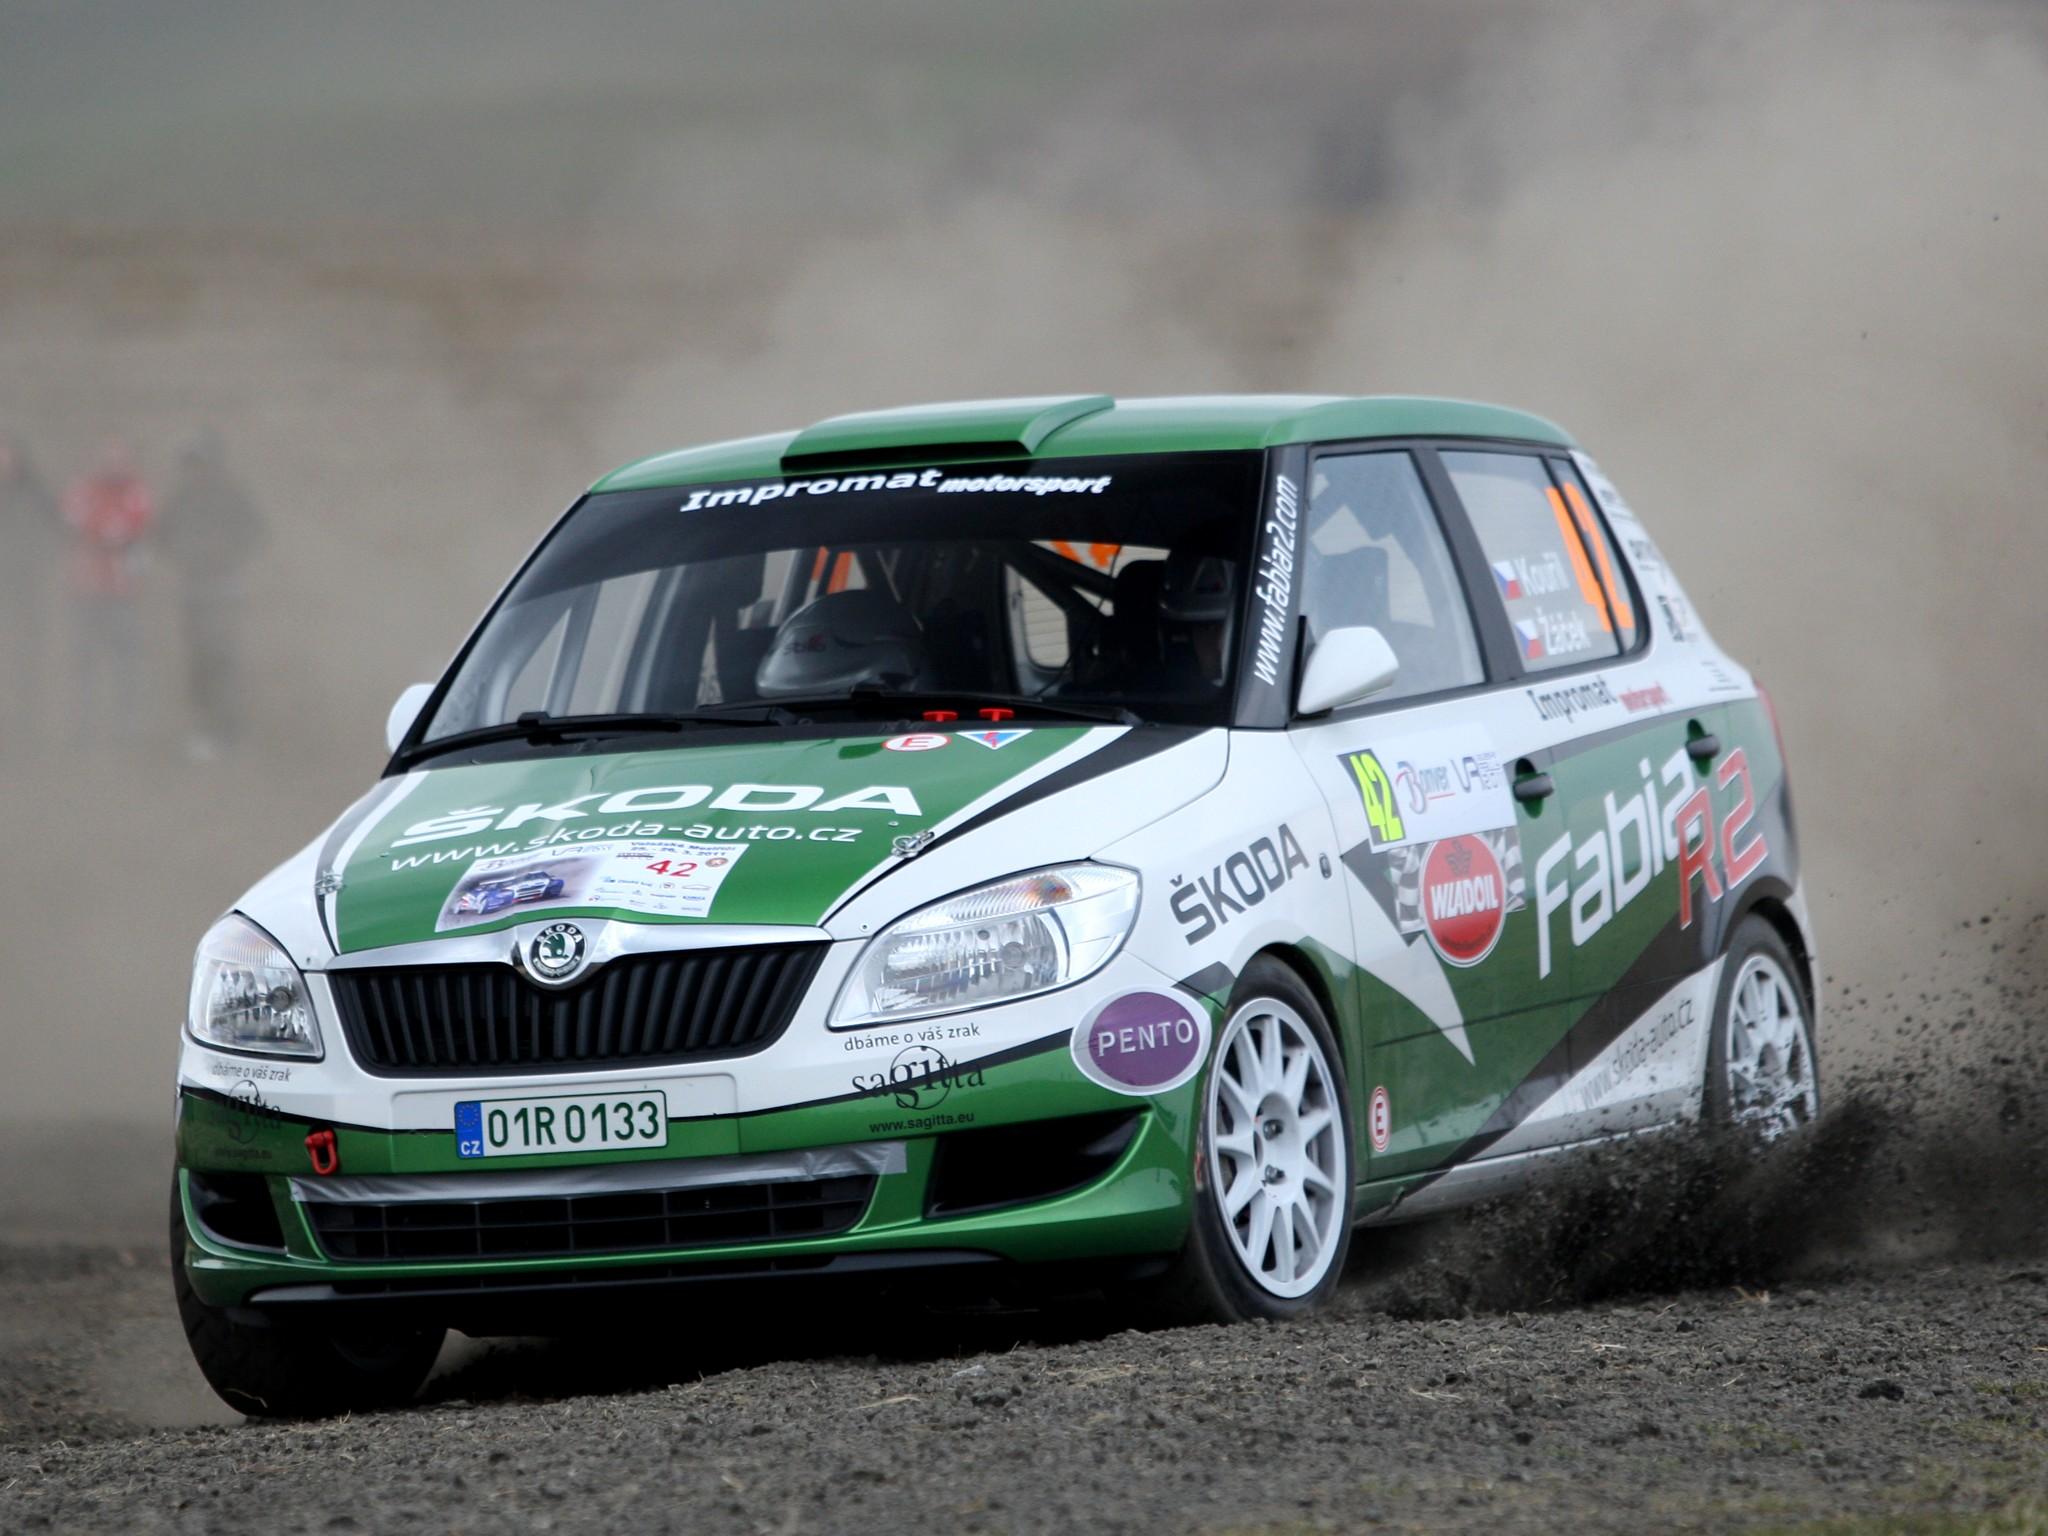 Skoda-Fabia-R2-Rally-2011-Photo-03.jpg